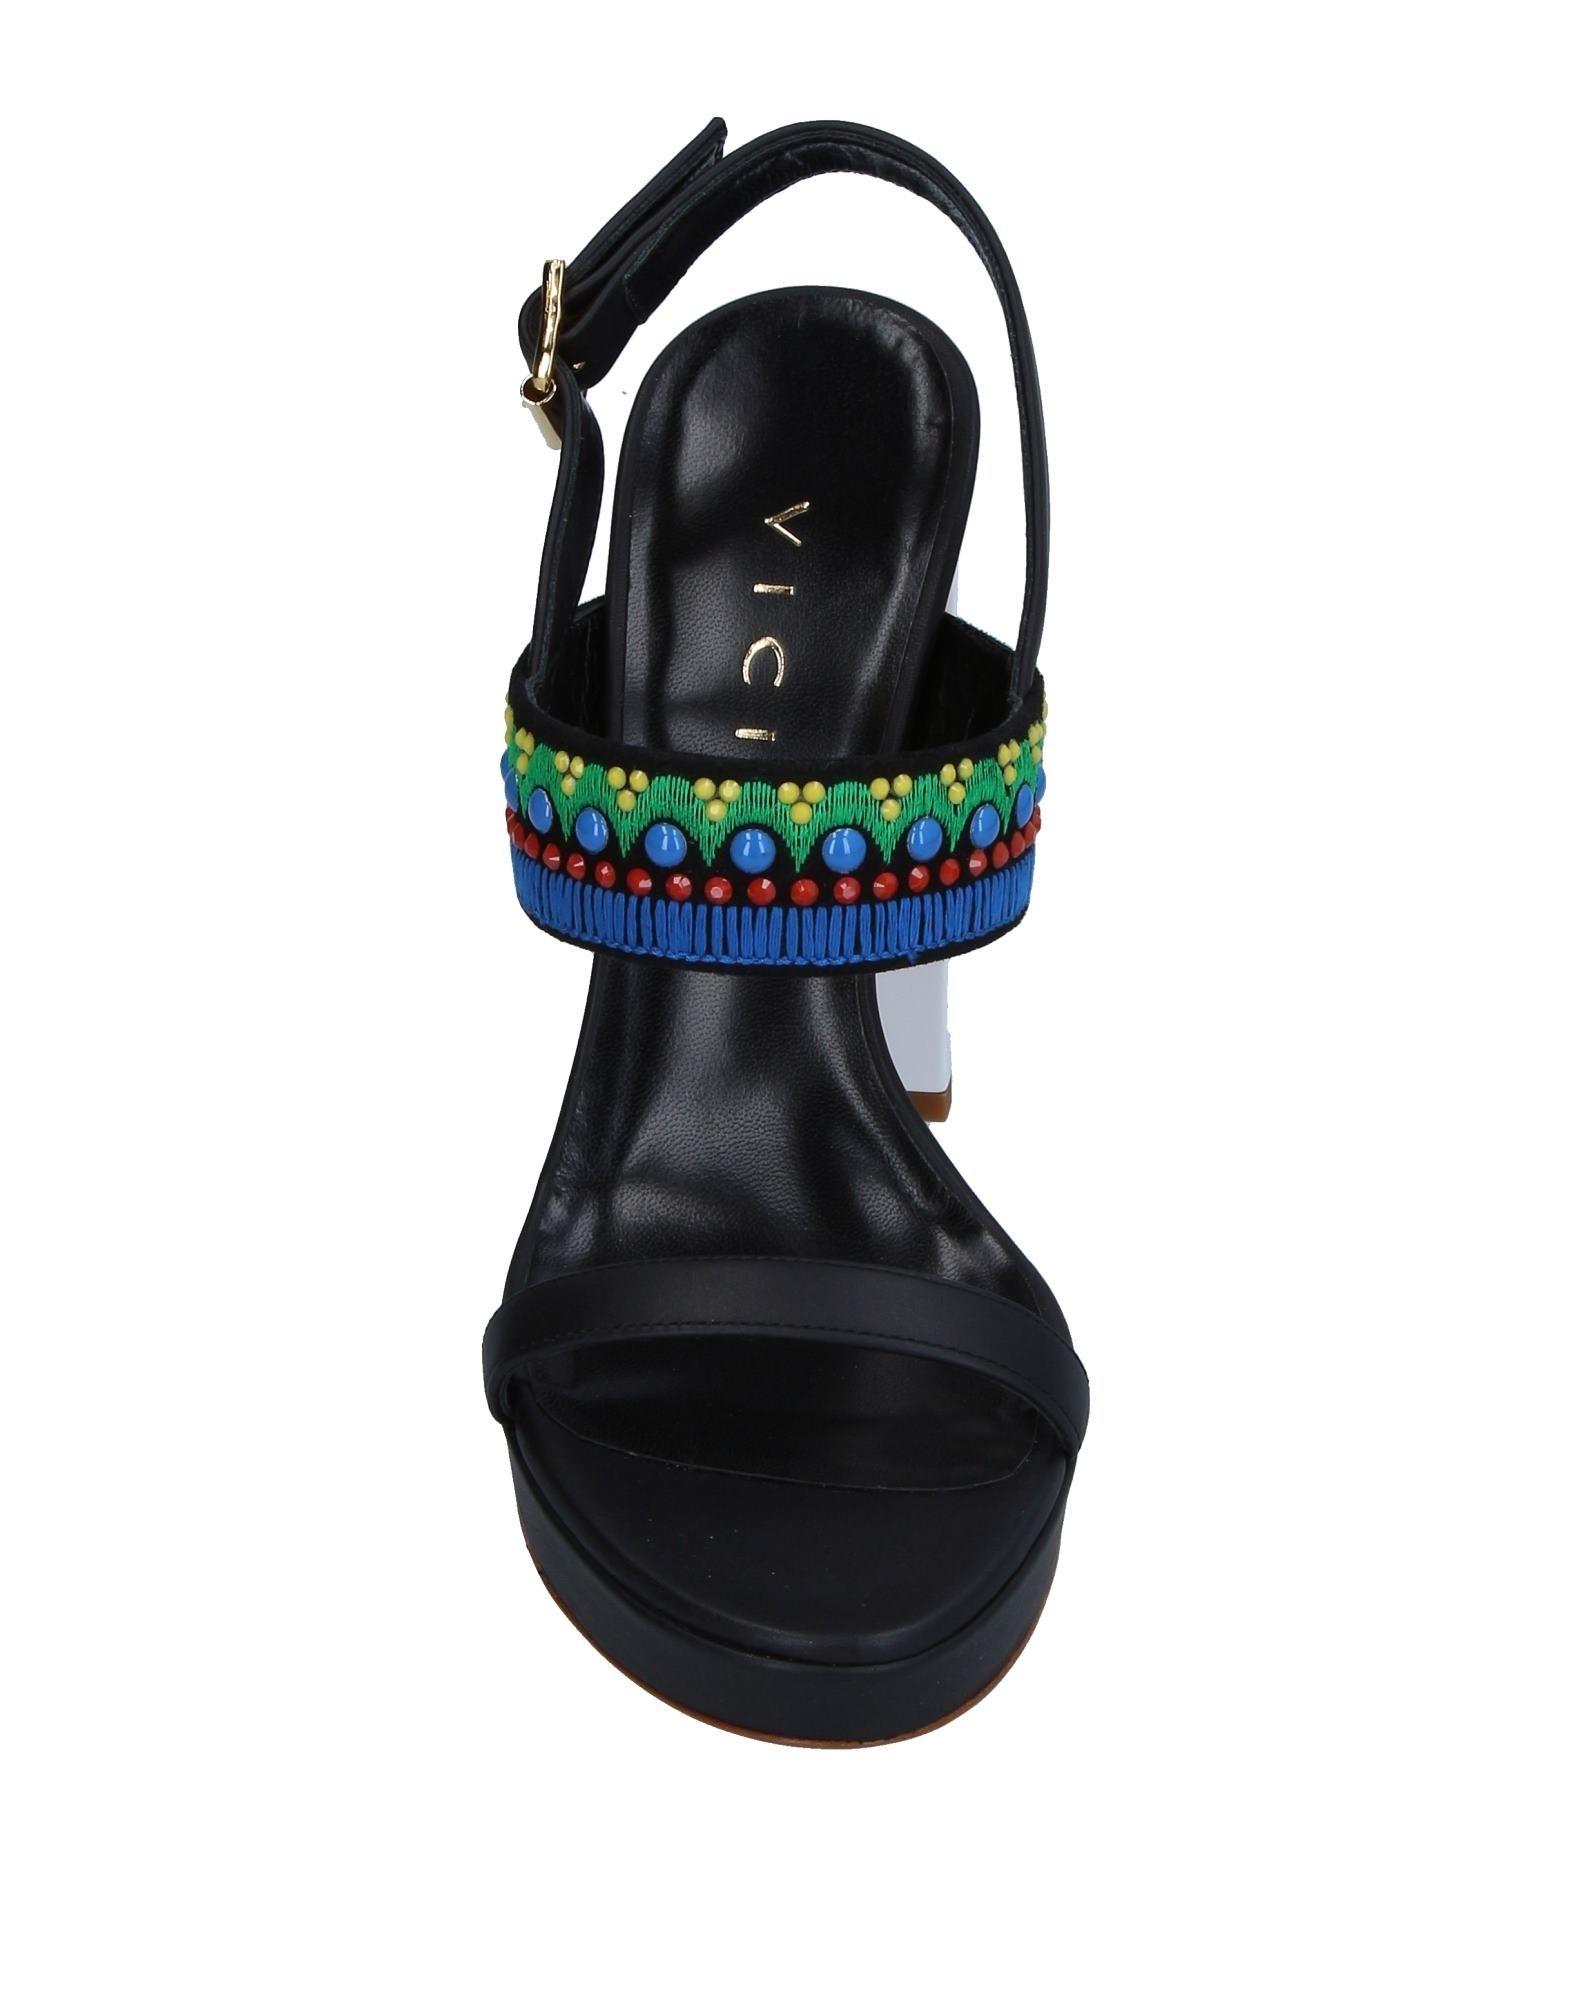 Stilvolle billige  Schuhe Vicini Sandalen Damen  billige 11312315VN 9b556c